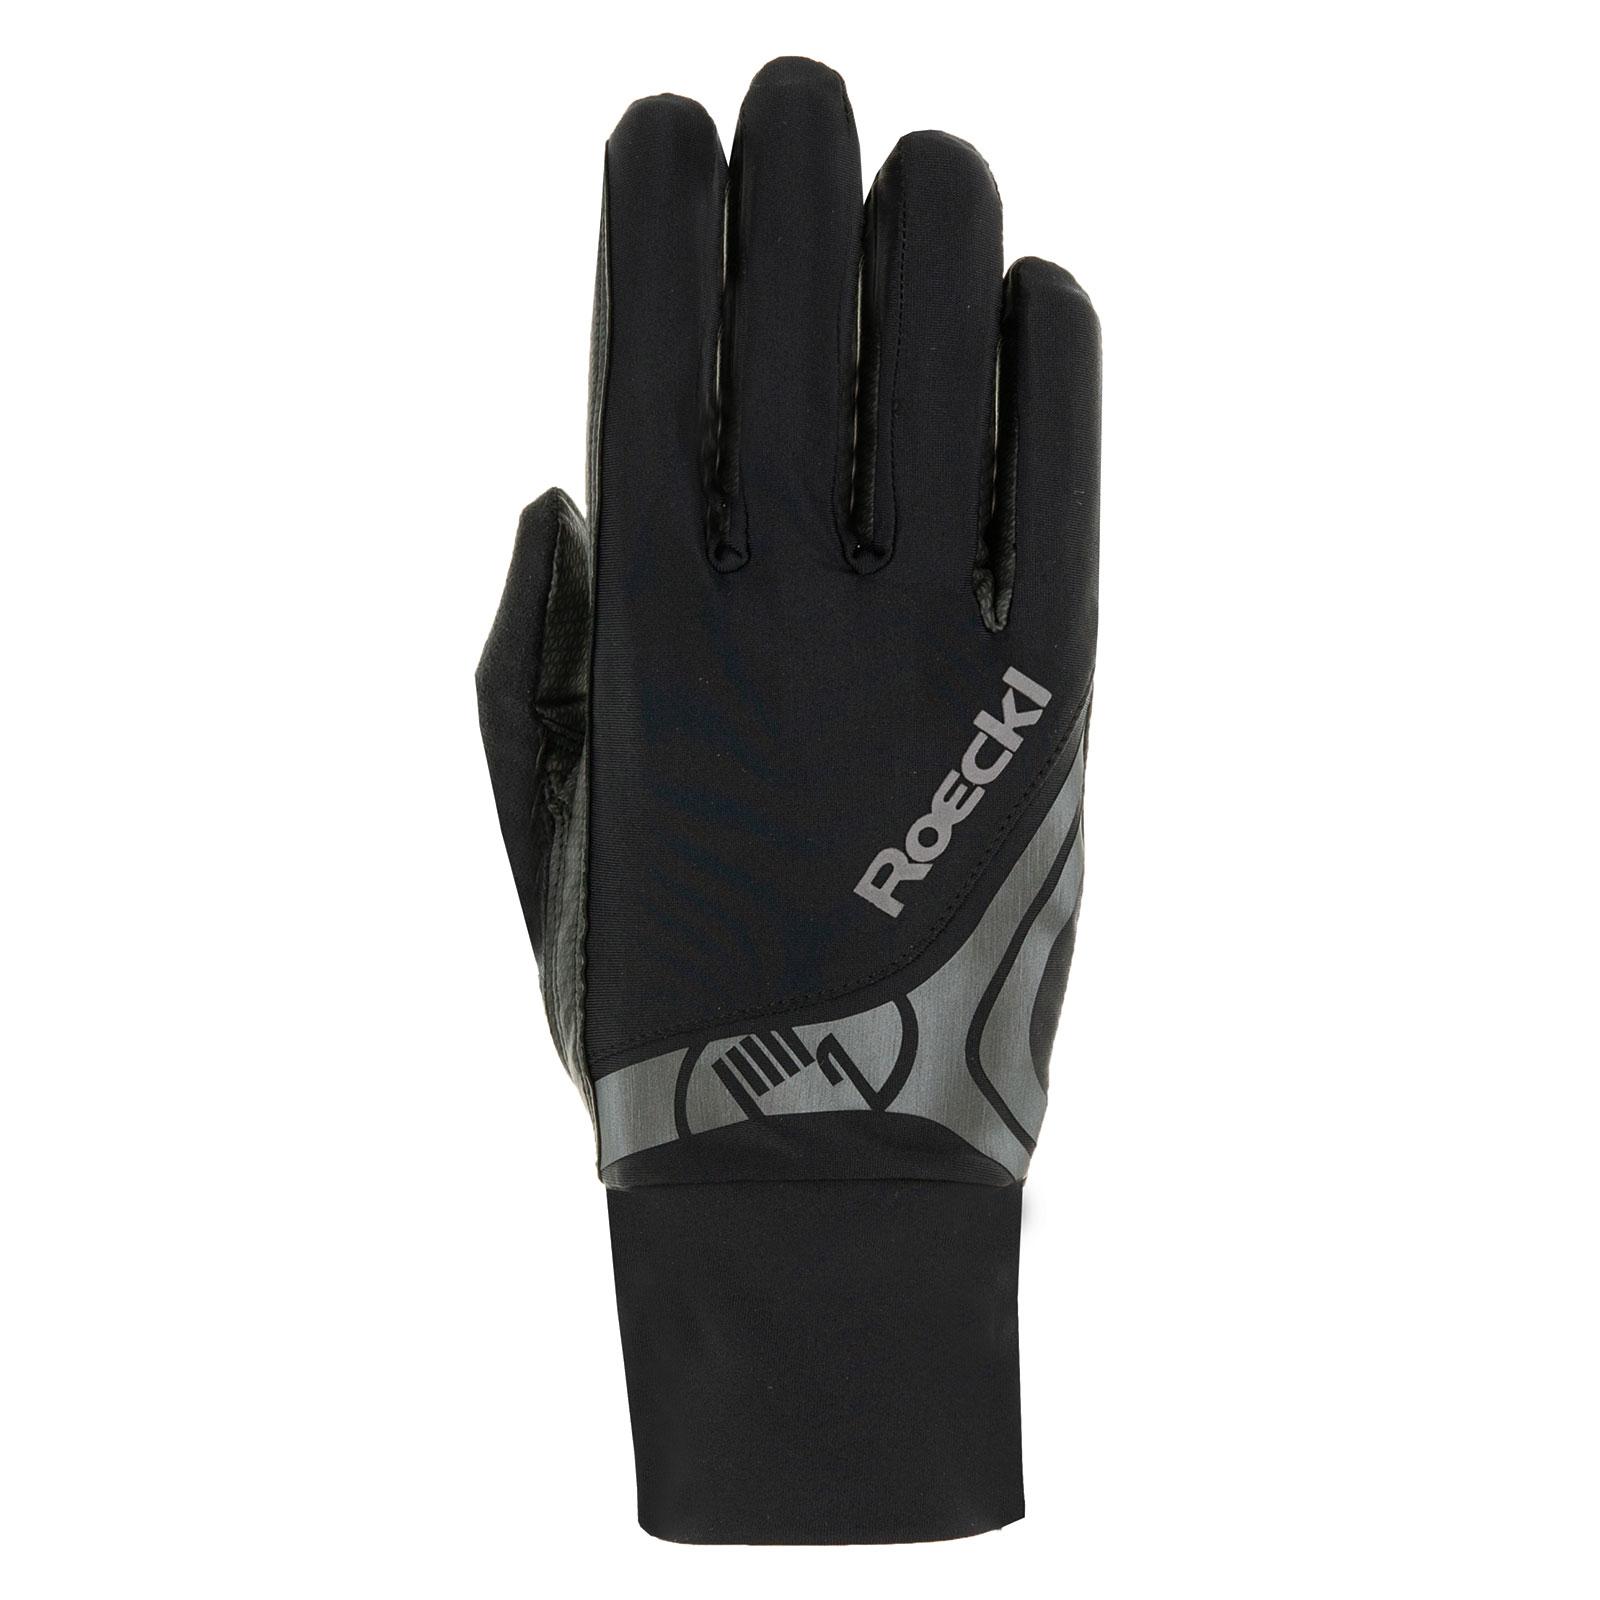 Roeckl Sports Melbourne Gloves